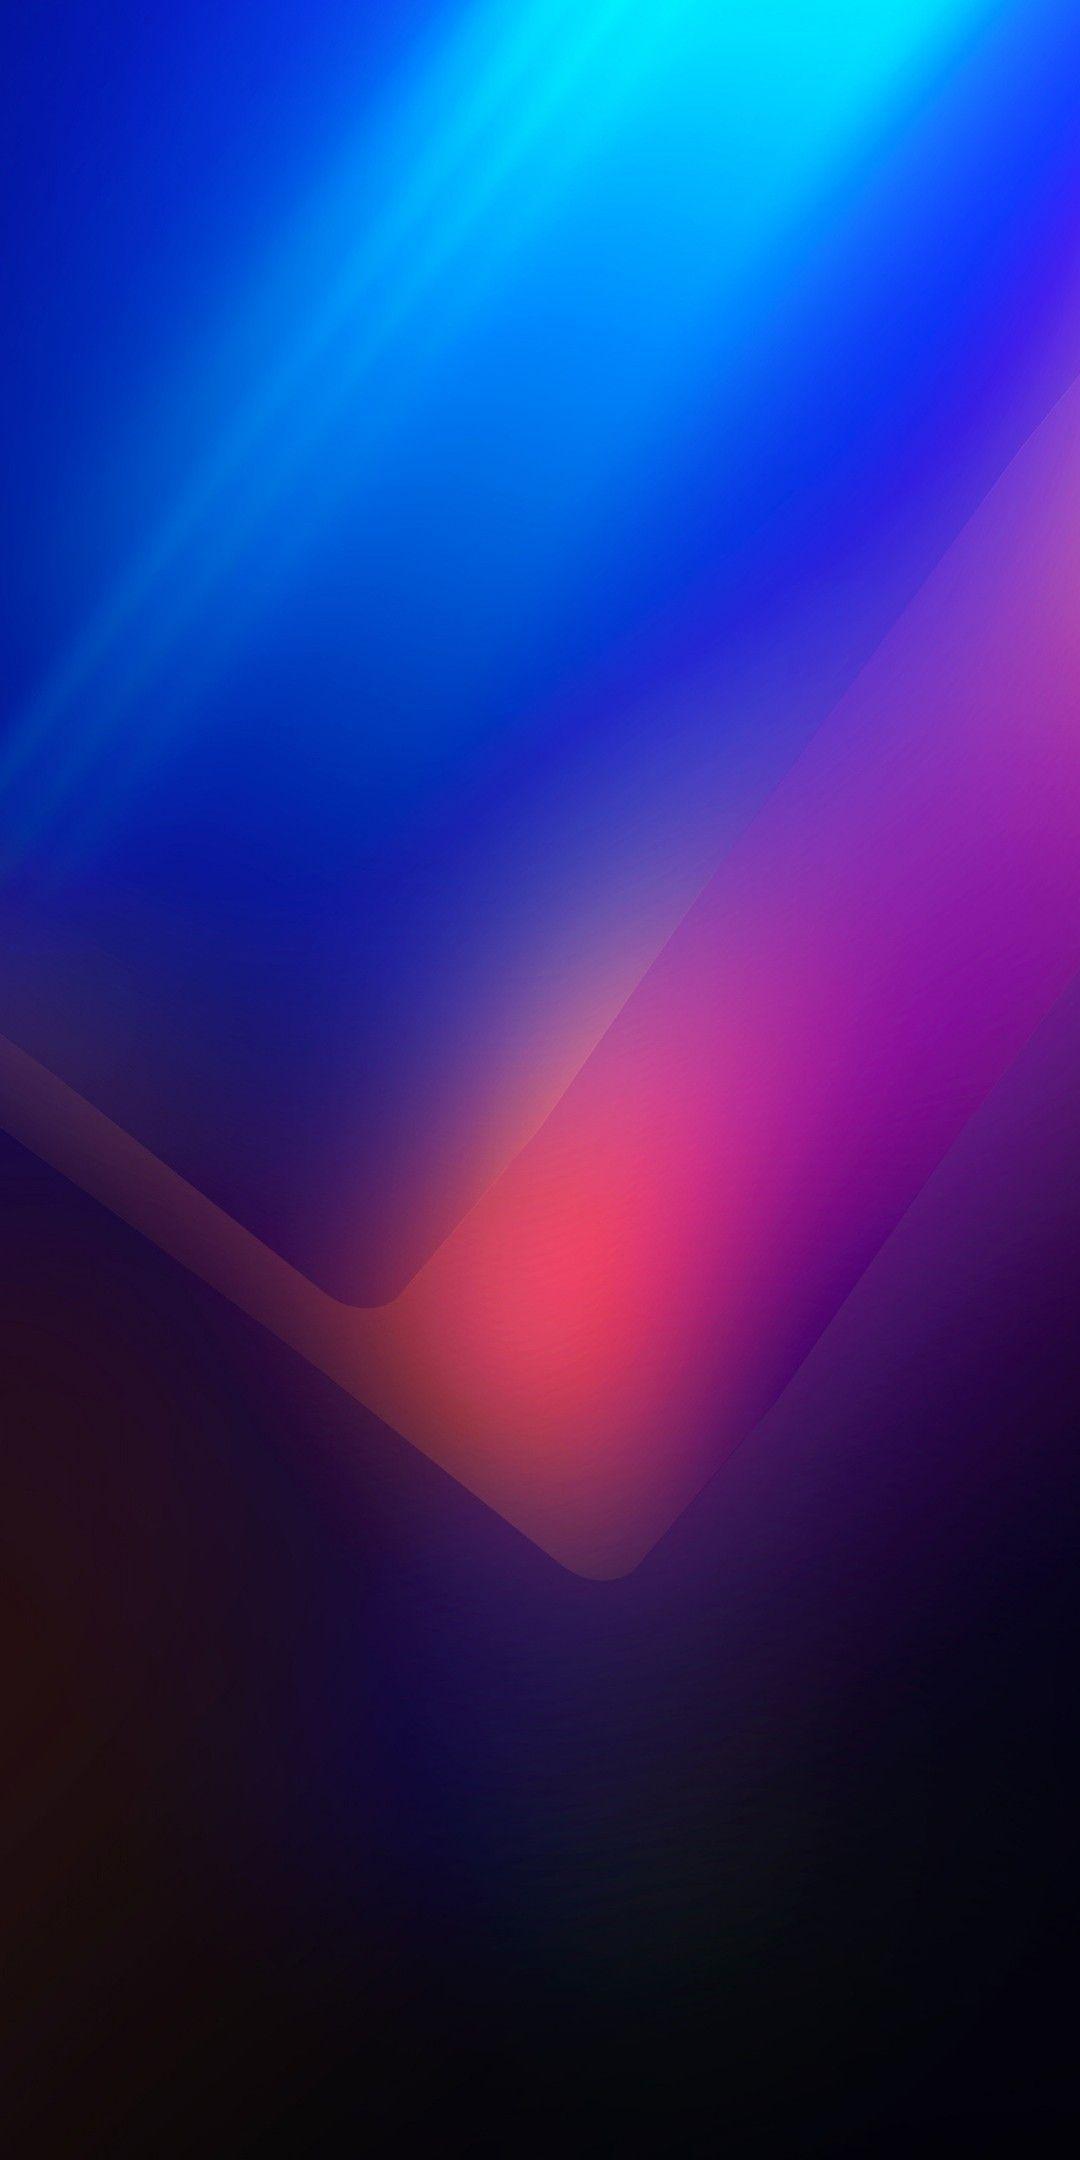 Unduh 44 Wallpaper Hd Xiaomi Redmi 6a Gratis Terbaik